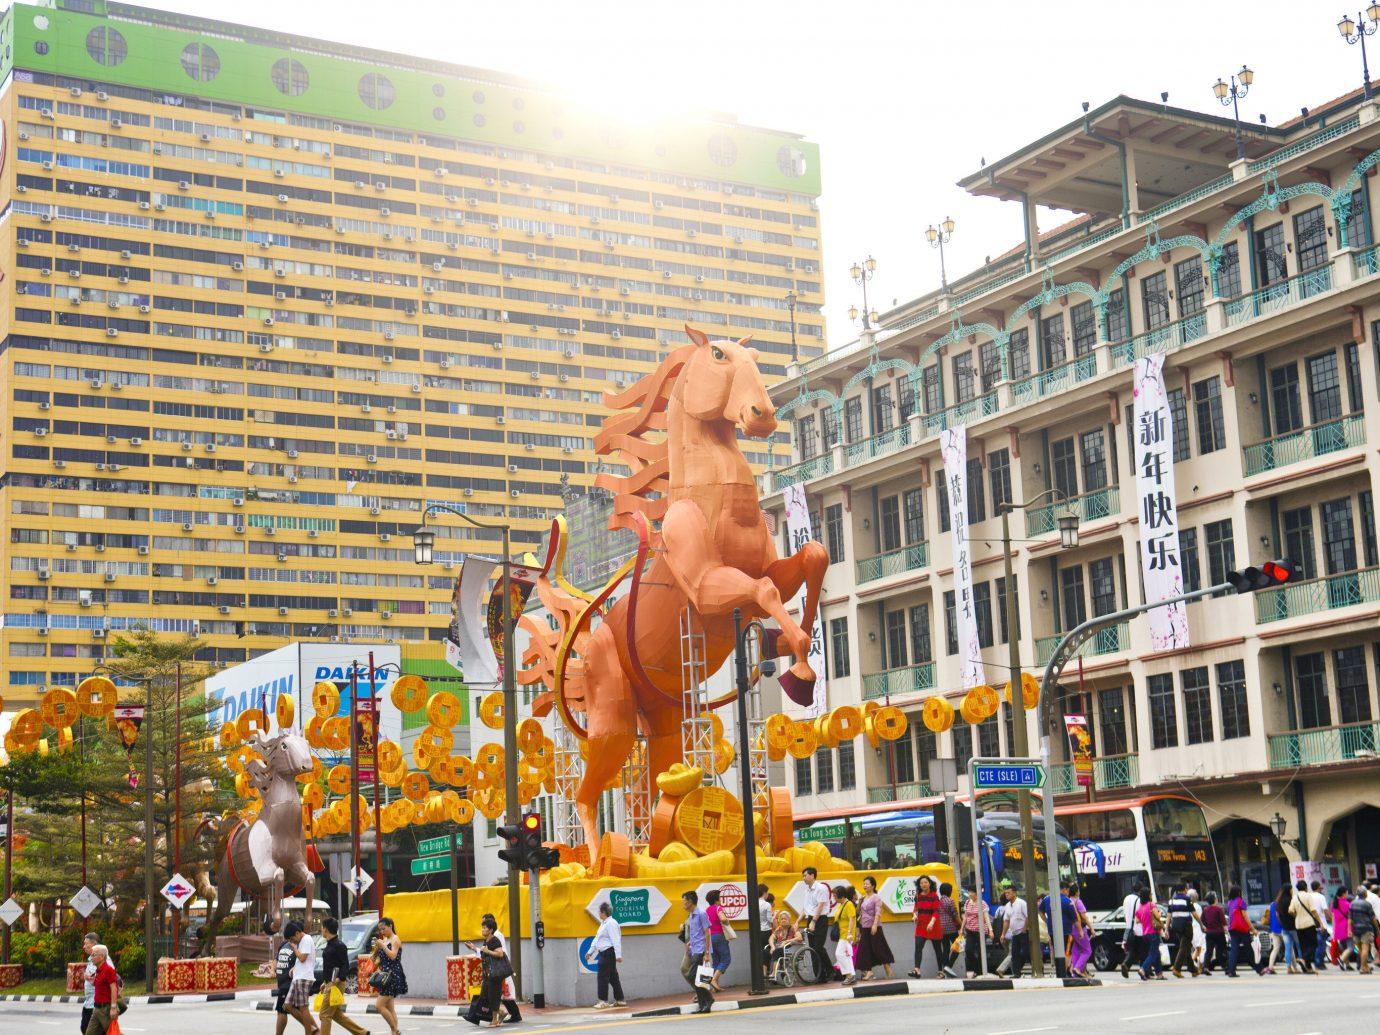 Offbeat Singapore Trip Ideas building outdoor plaza art advertising crowd